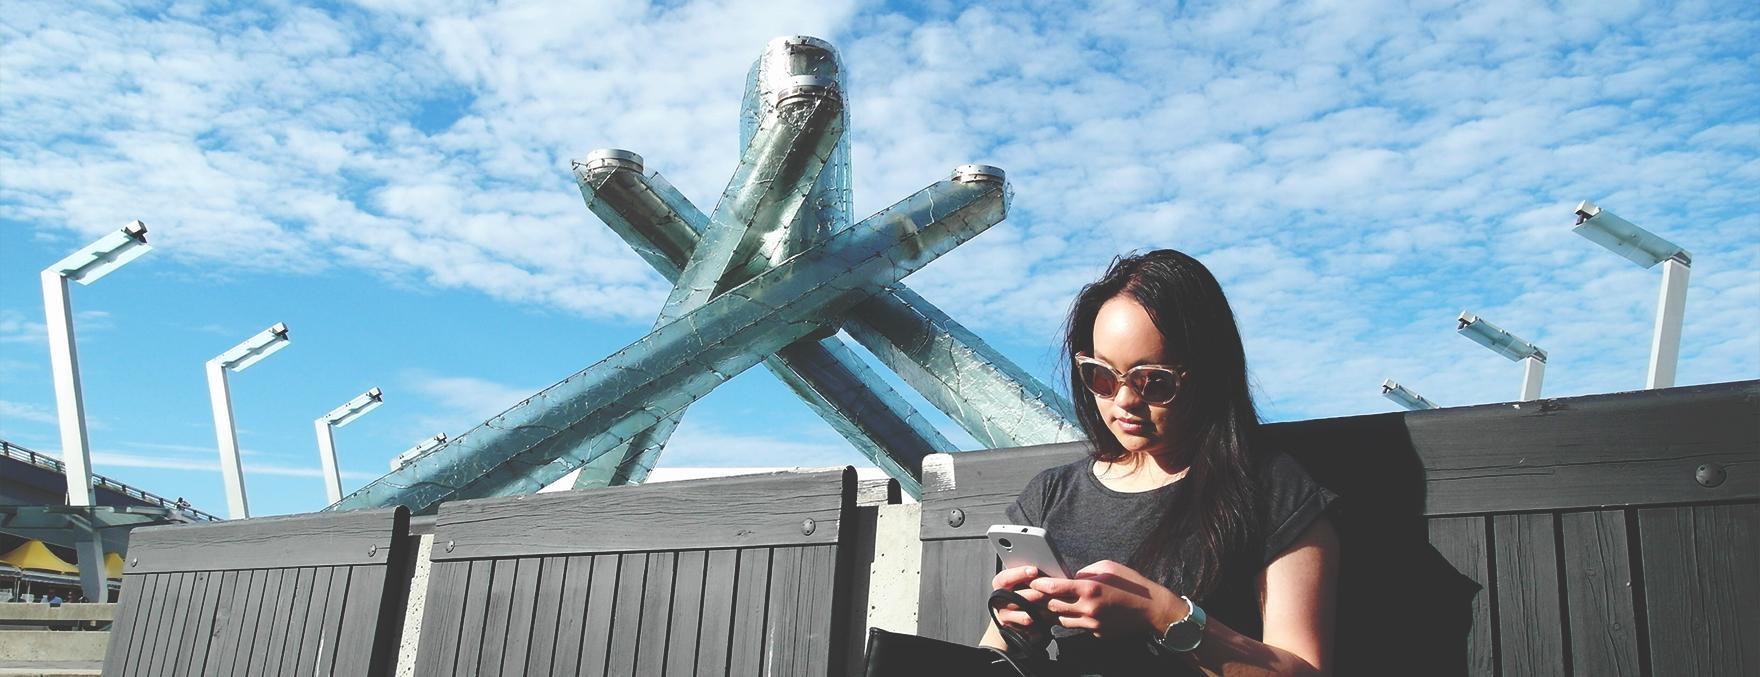 Vancouver Olympic Cauldron Pokestop